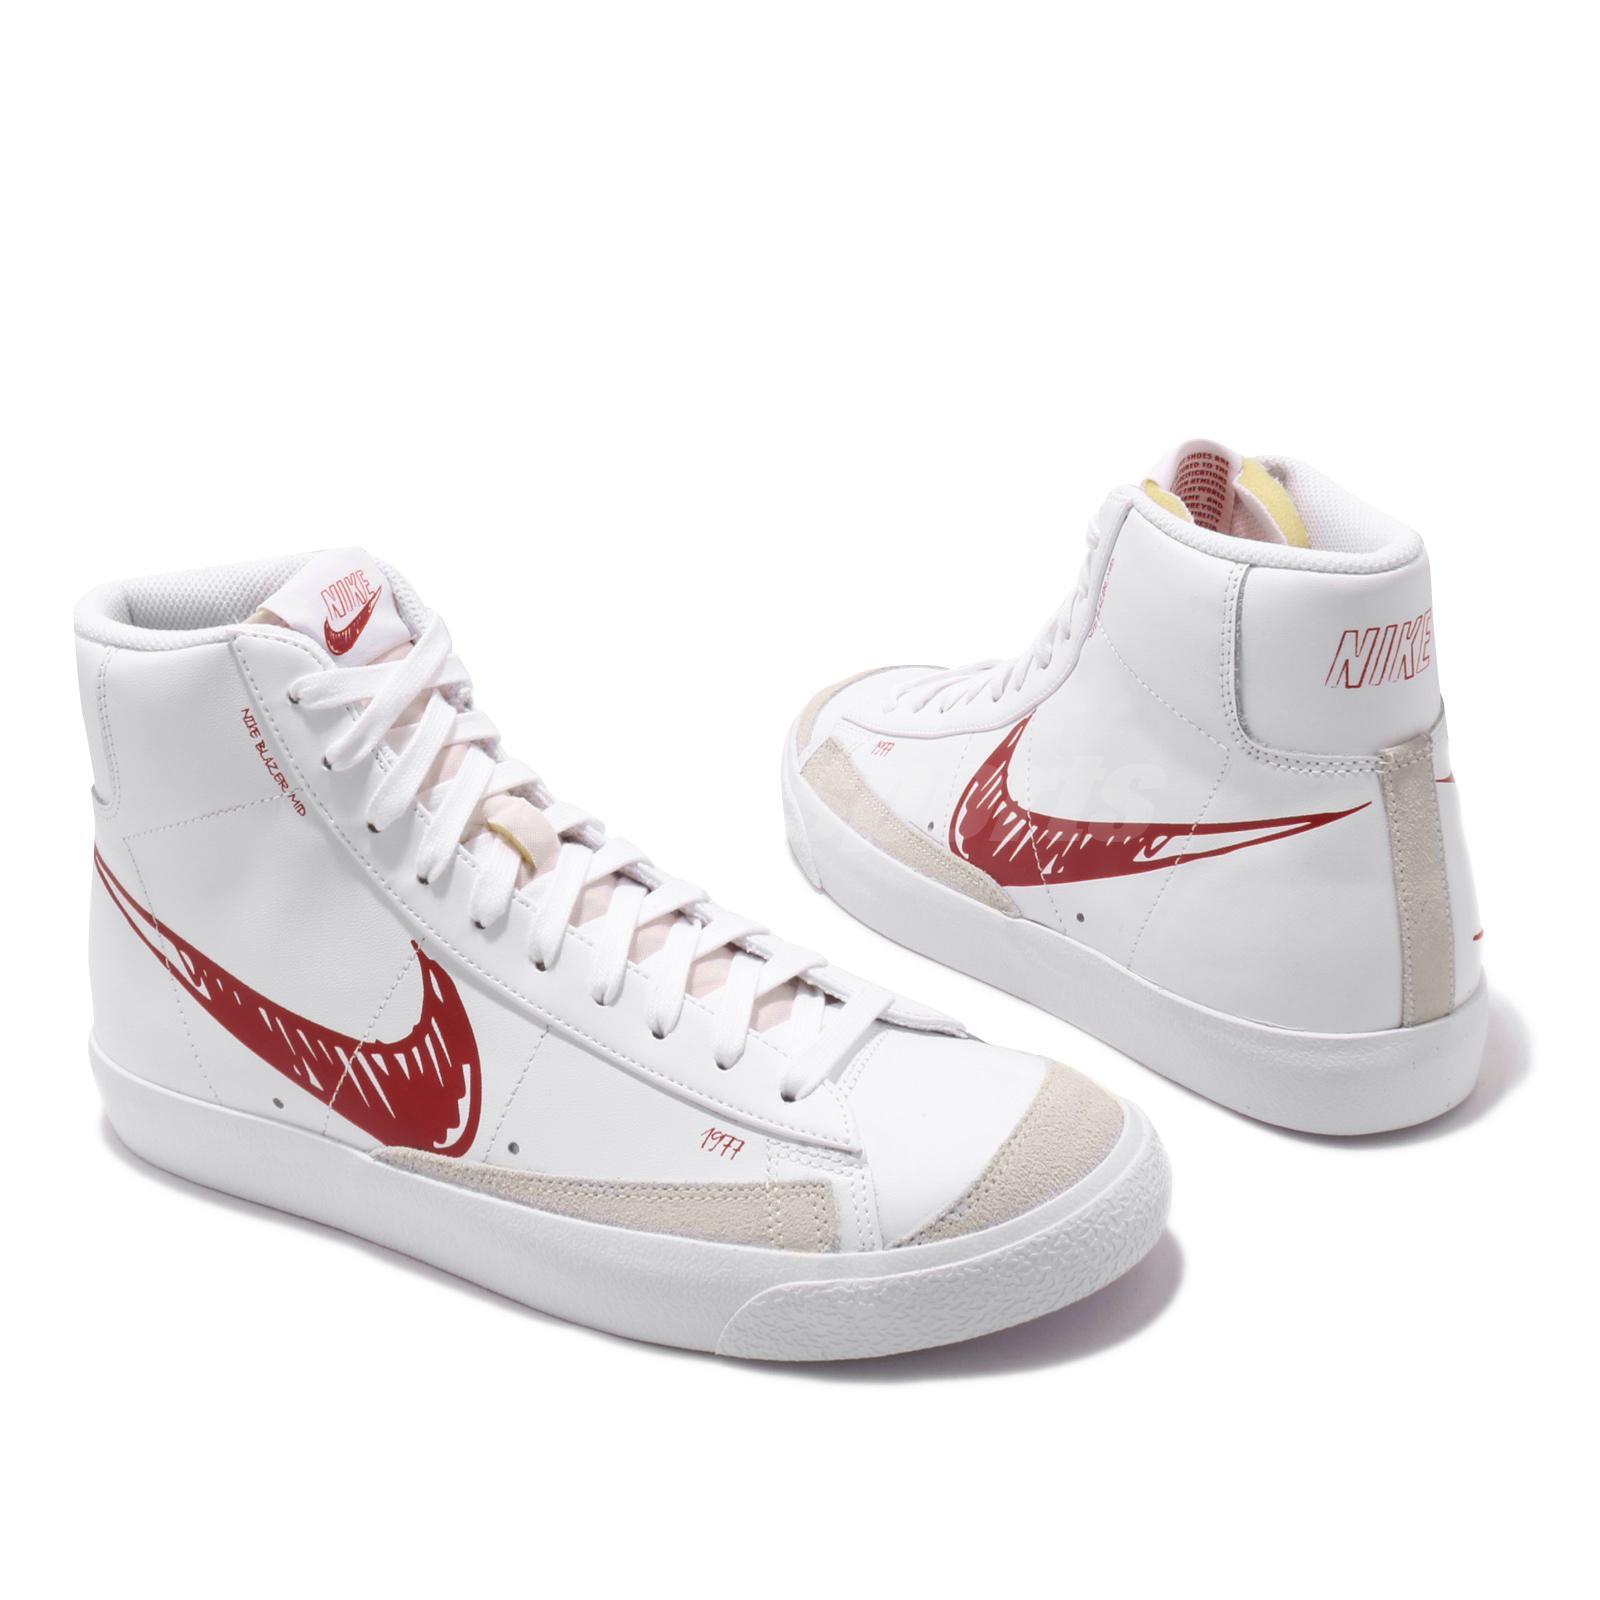 Details about Nike Blazer Mid VNTG 77 Sketch White Red Women Men Vintage  Shoes CW7580-100